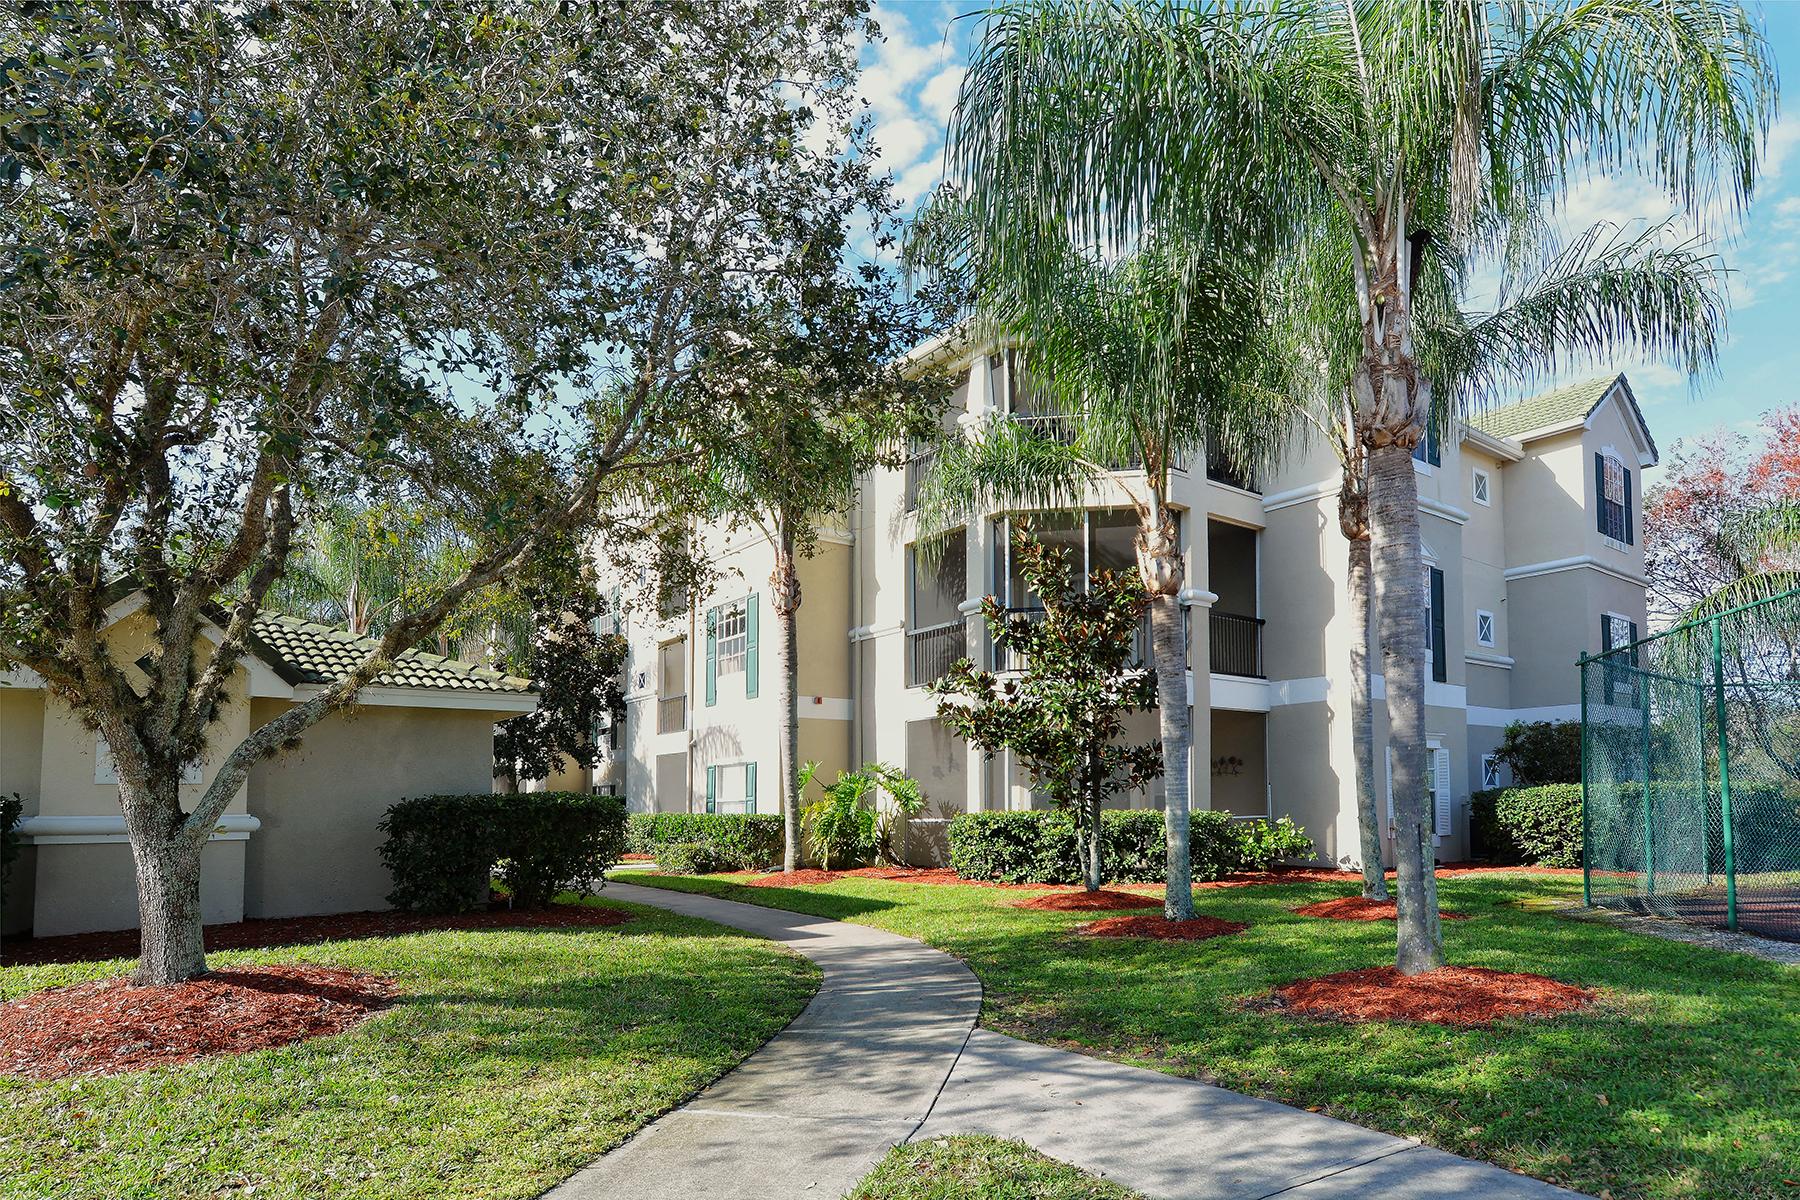 Condominium for Sale at SARASOTA 5140 Northridge Rd 203, Sarasota, Florida 34238 United States